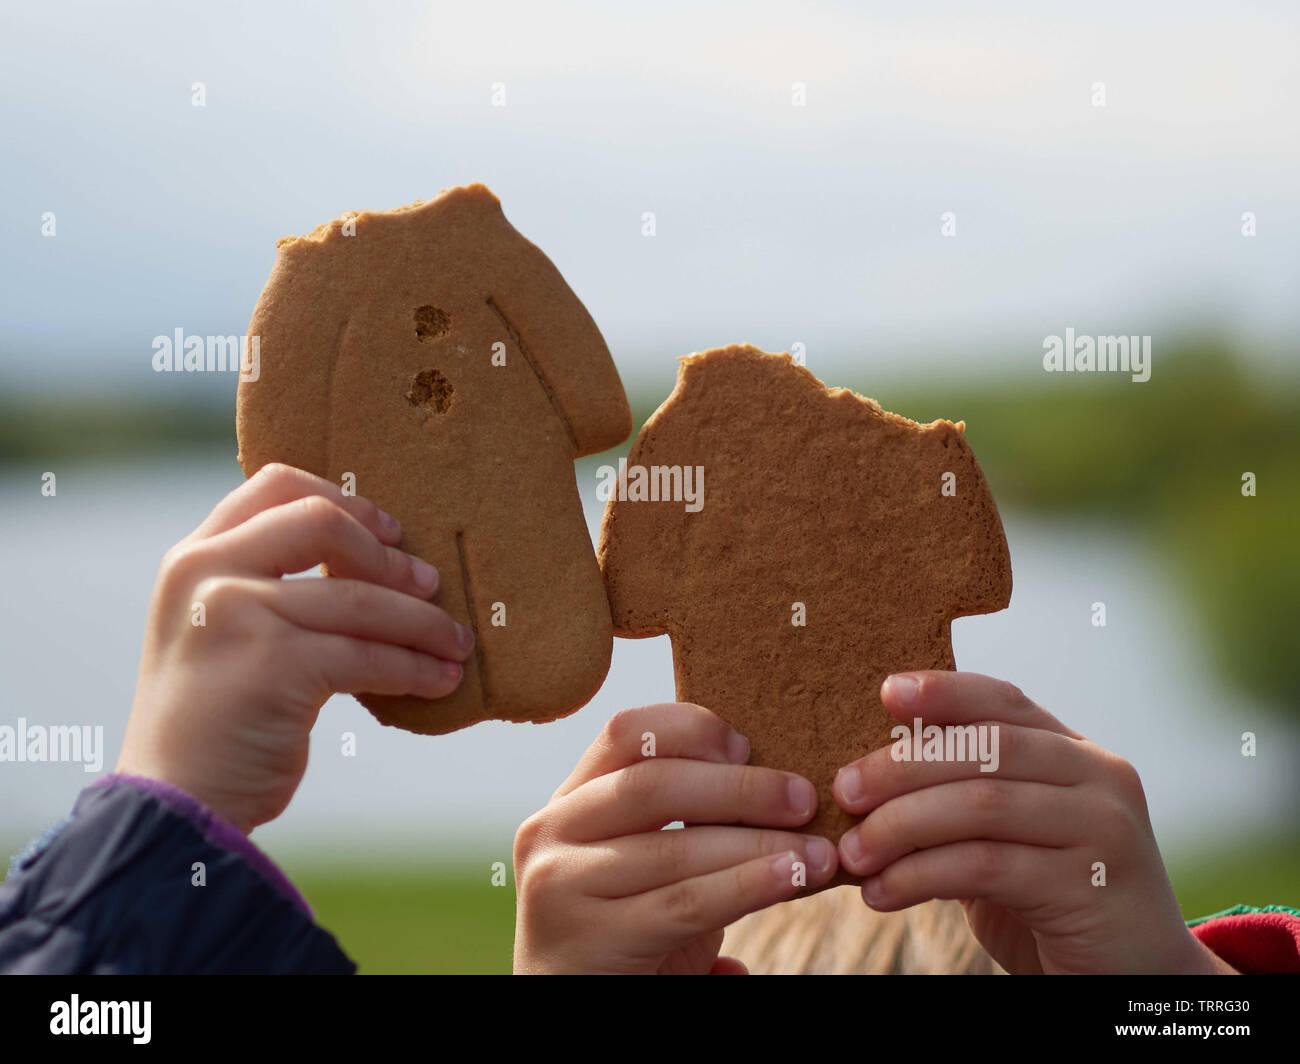 Headless gingerbread men - Manvers Lake, Wath-upon-Dearne, Rotherham, South Yorkshire, UK Stock Photo